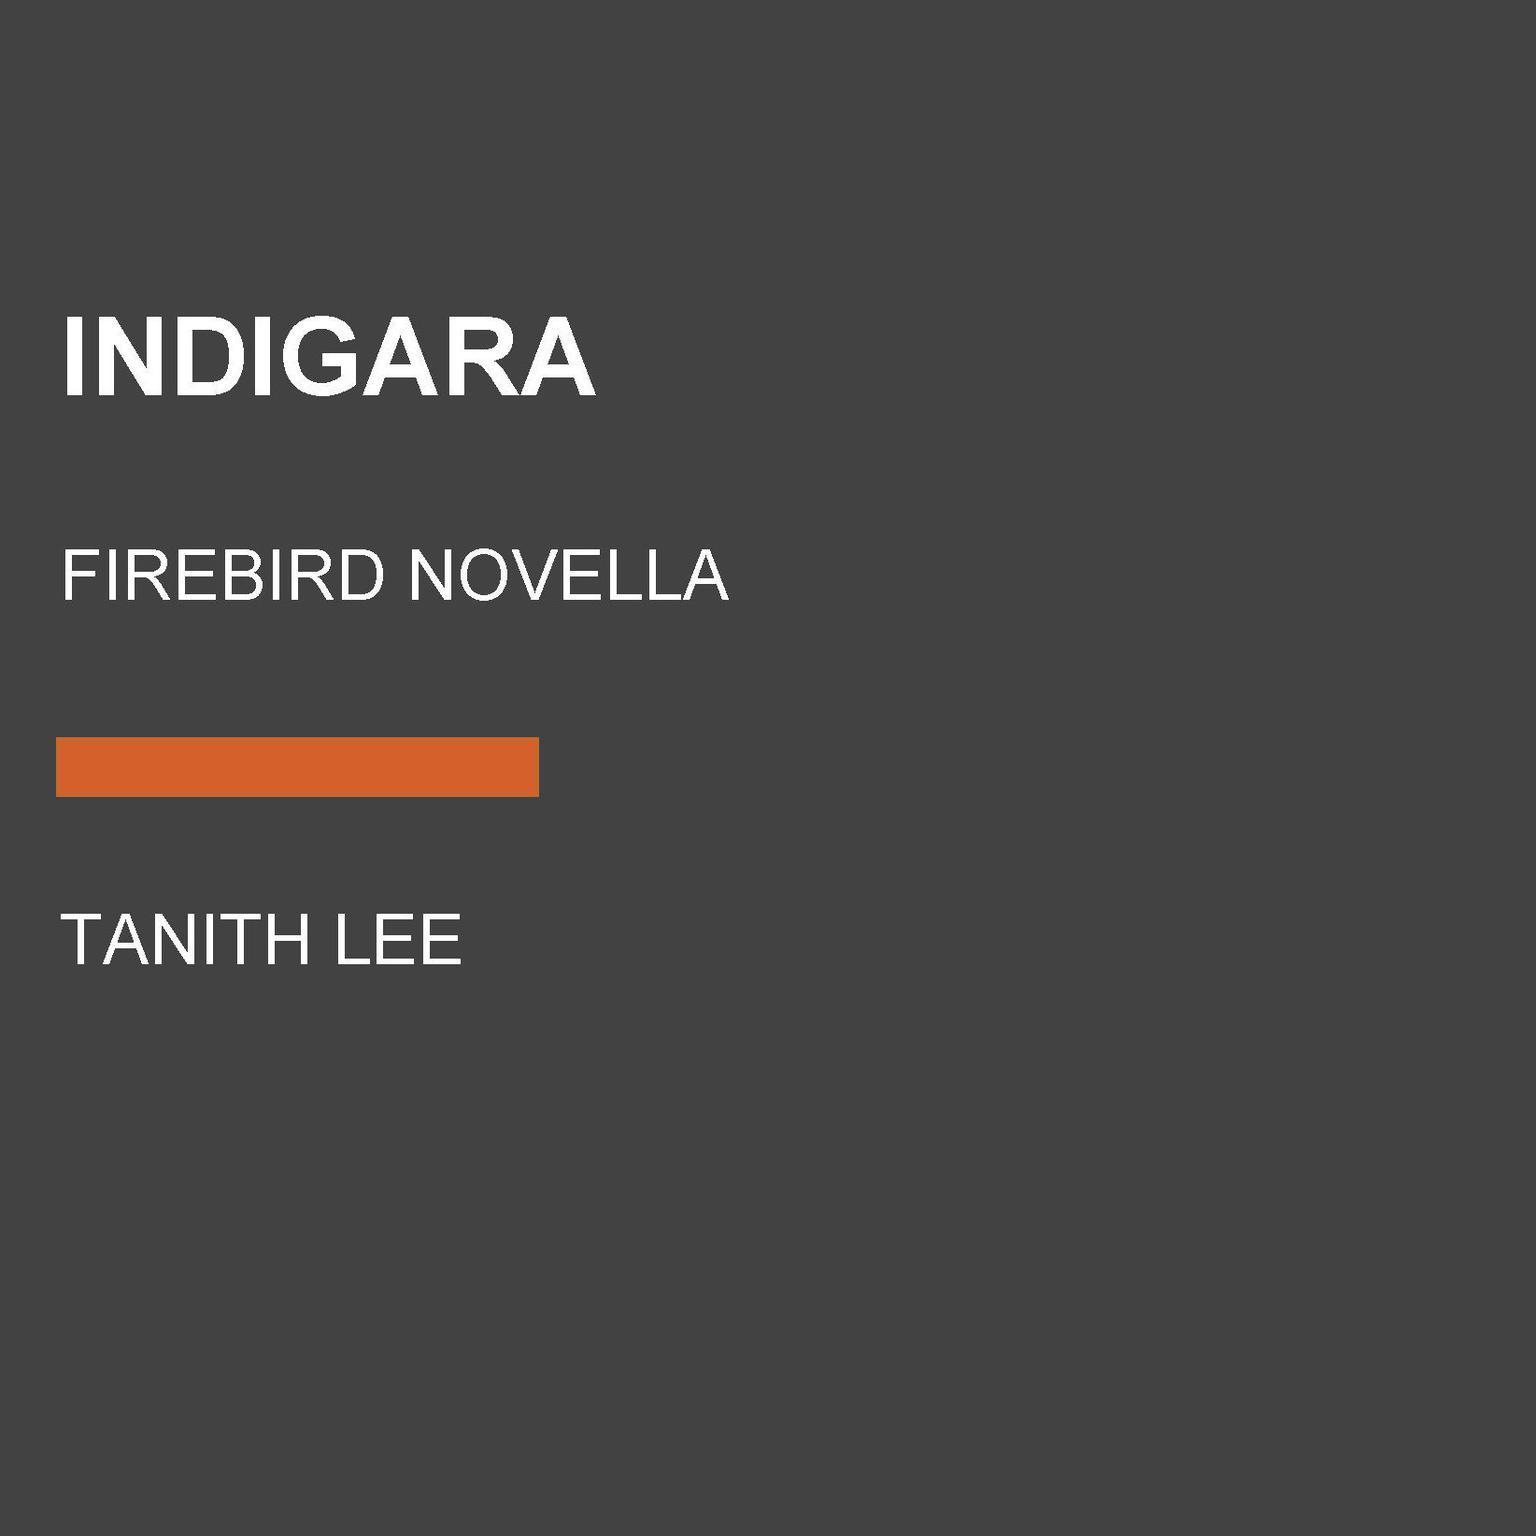 Indigara: Firebird Novella Audiobook, by Tanith Lee